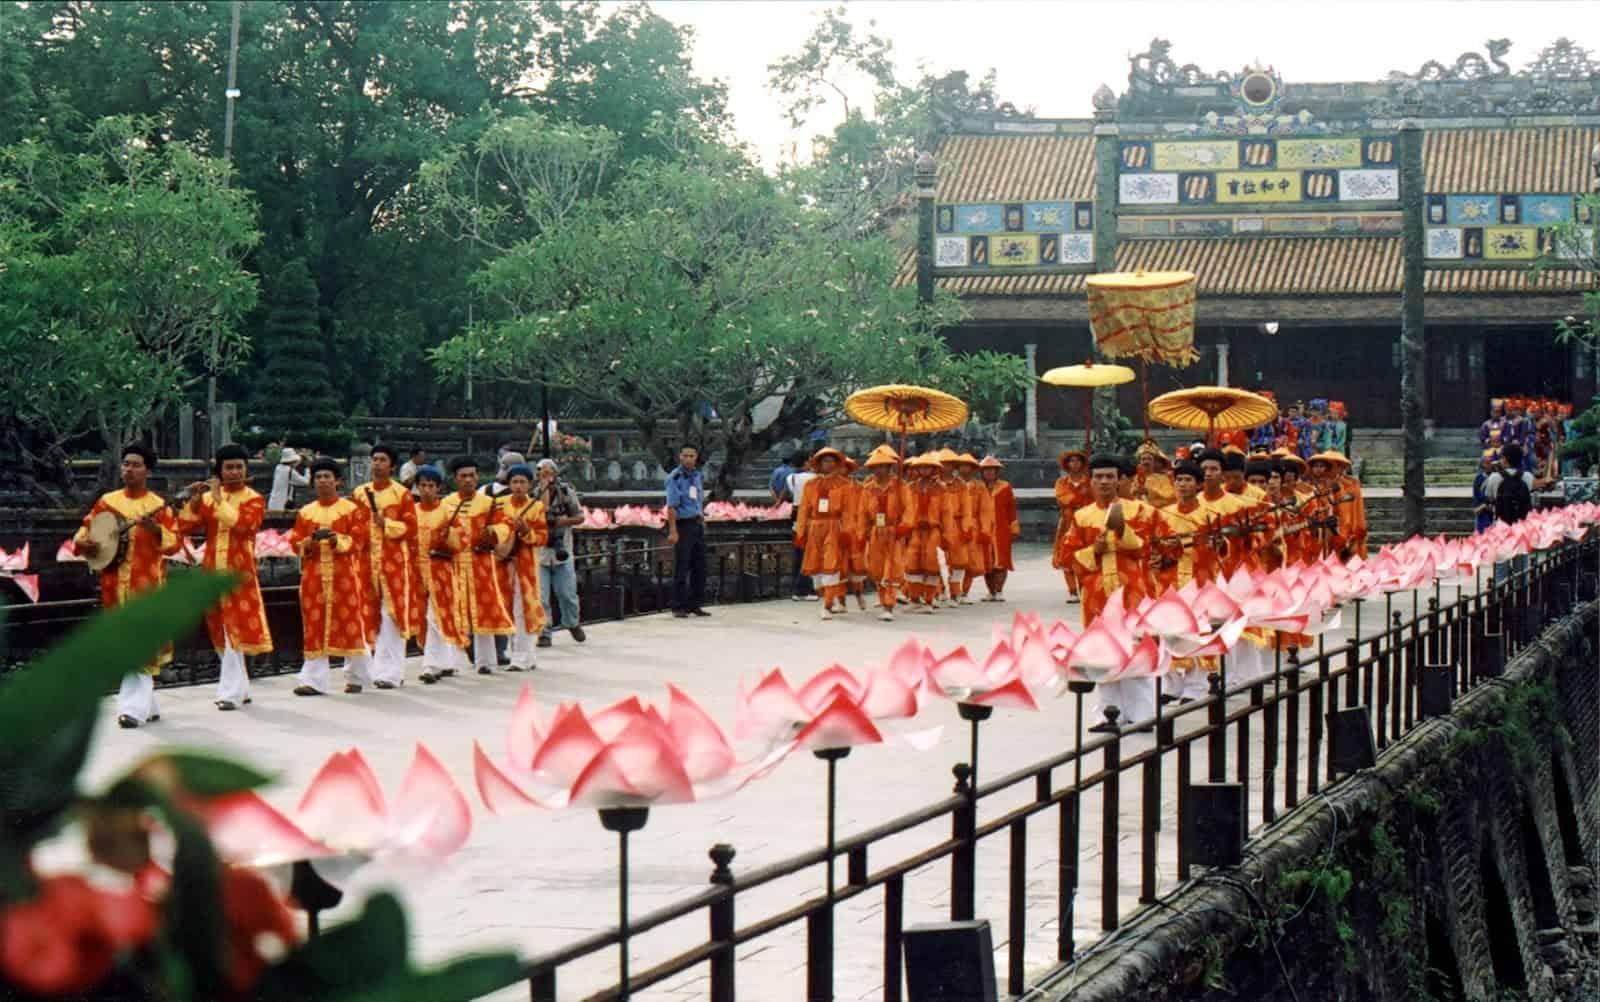 Cultural values of Nam Giao Esplanade